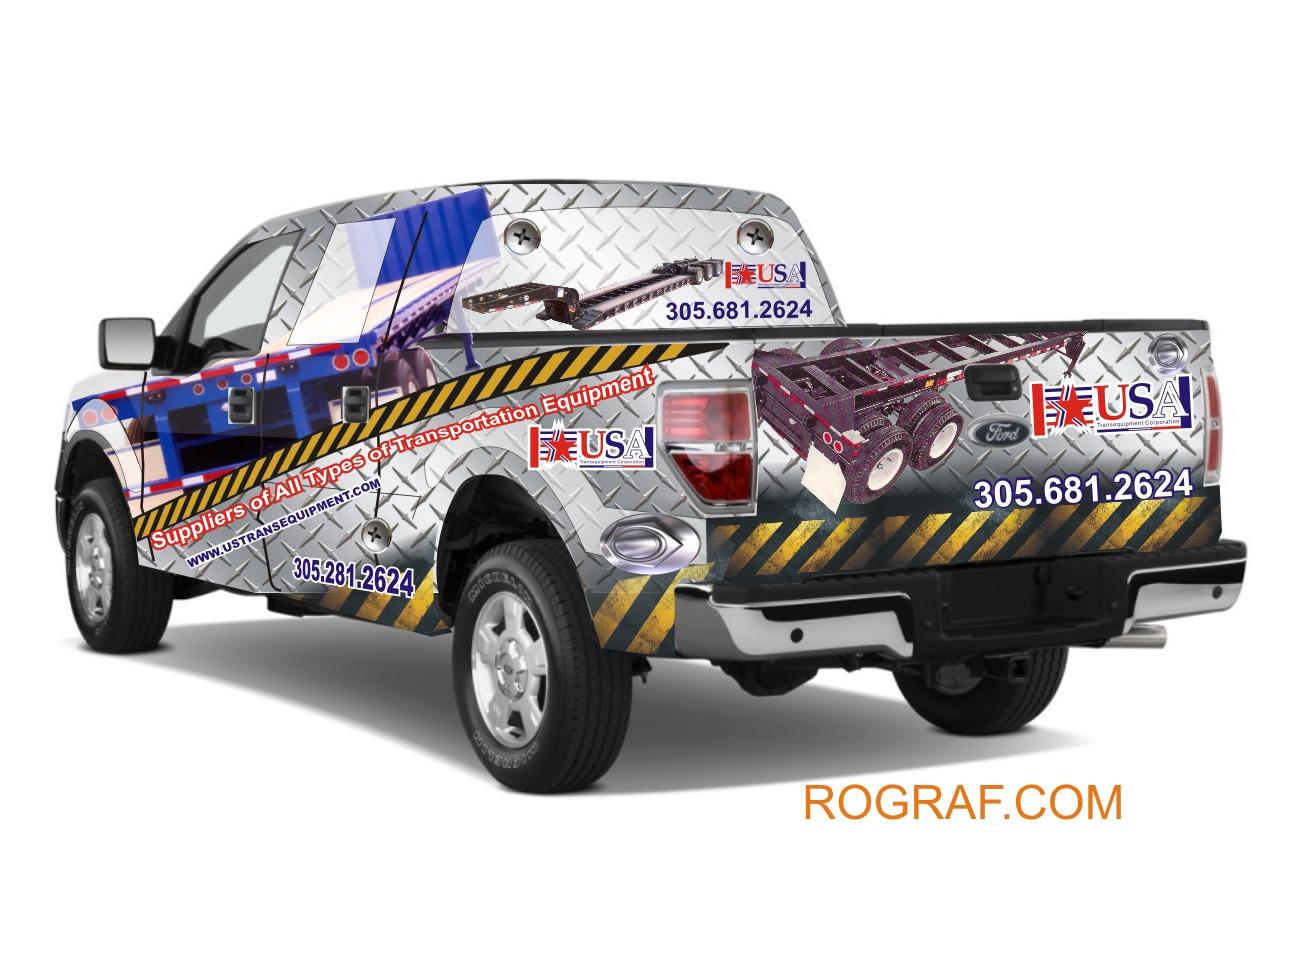 Truck wraps - Evoltura grafica en camioneta - Caso de estudio - case study, vehicle wrap. En 2004 -F 150 XLT Super crub .Cliente: USA equipment. miami florida